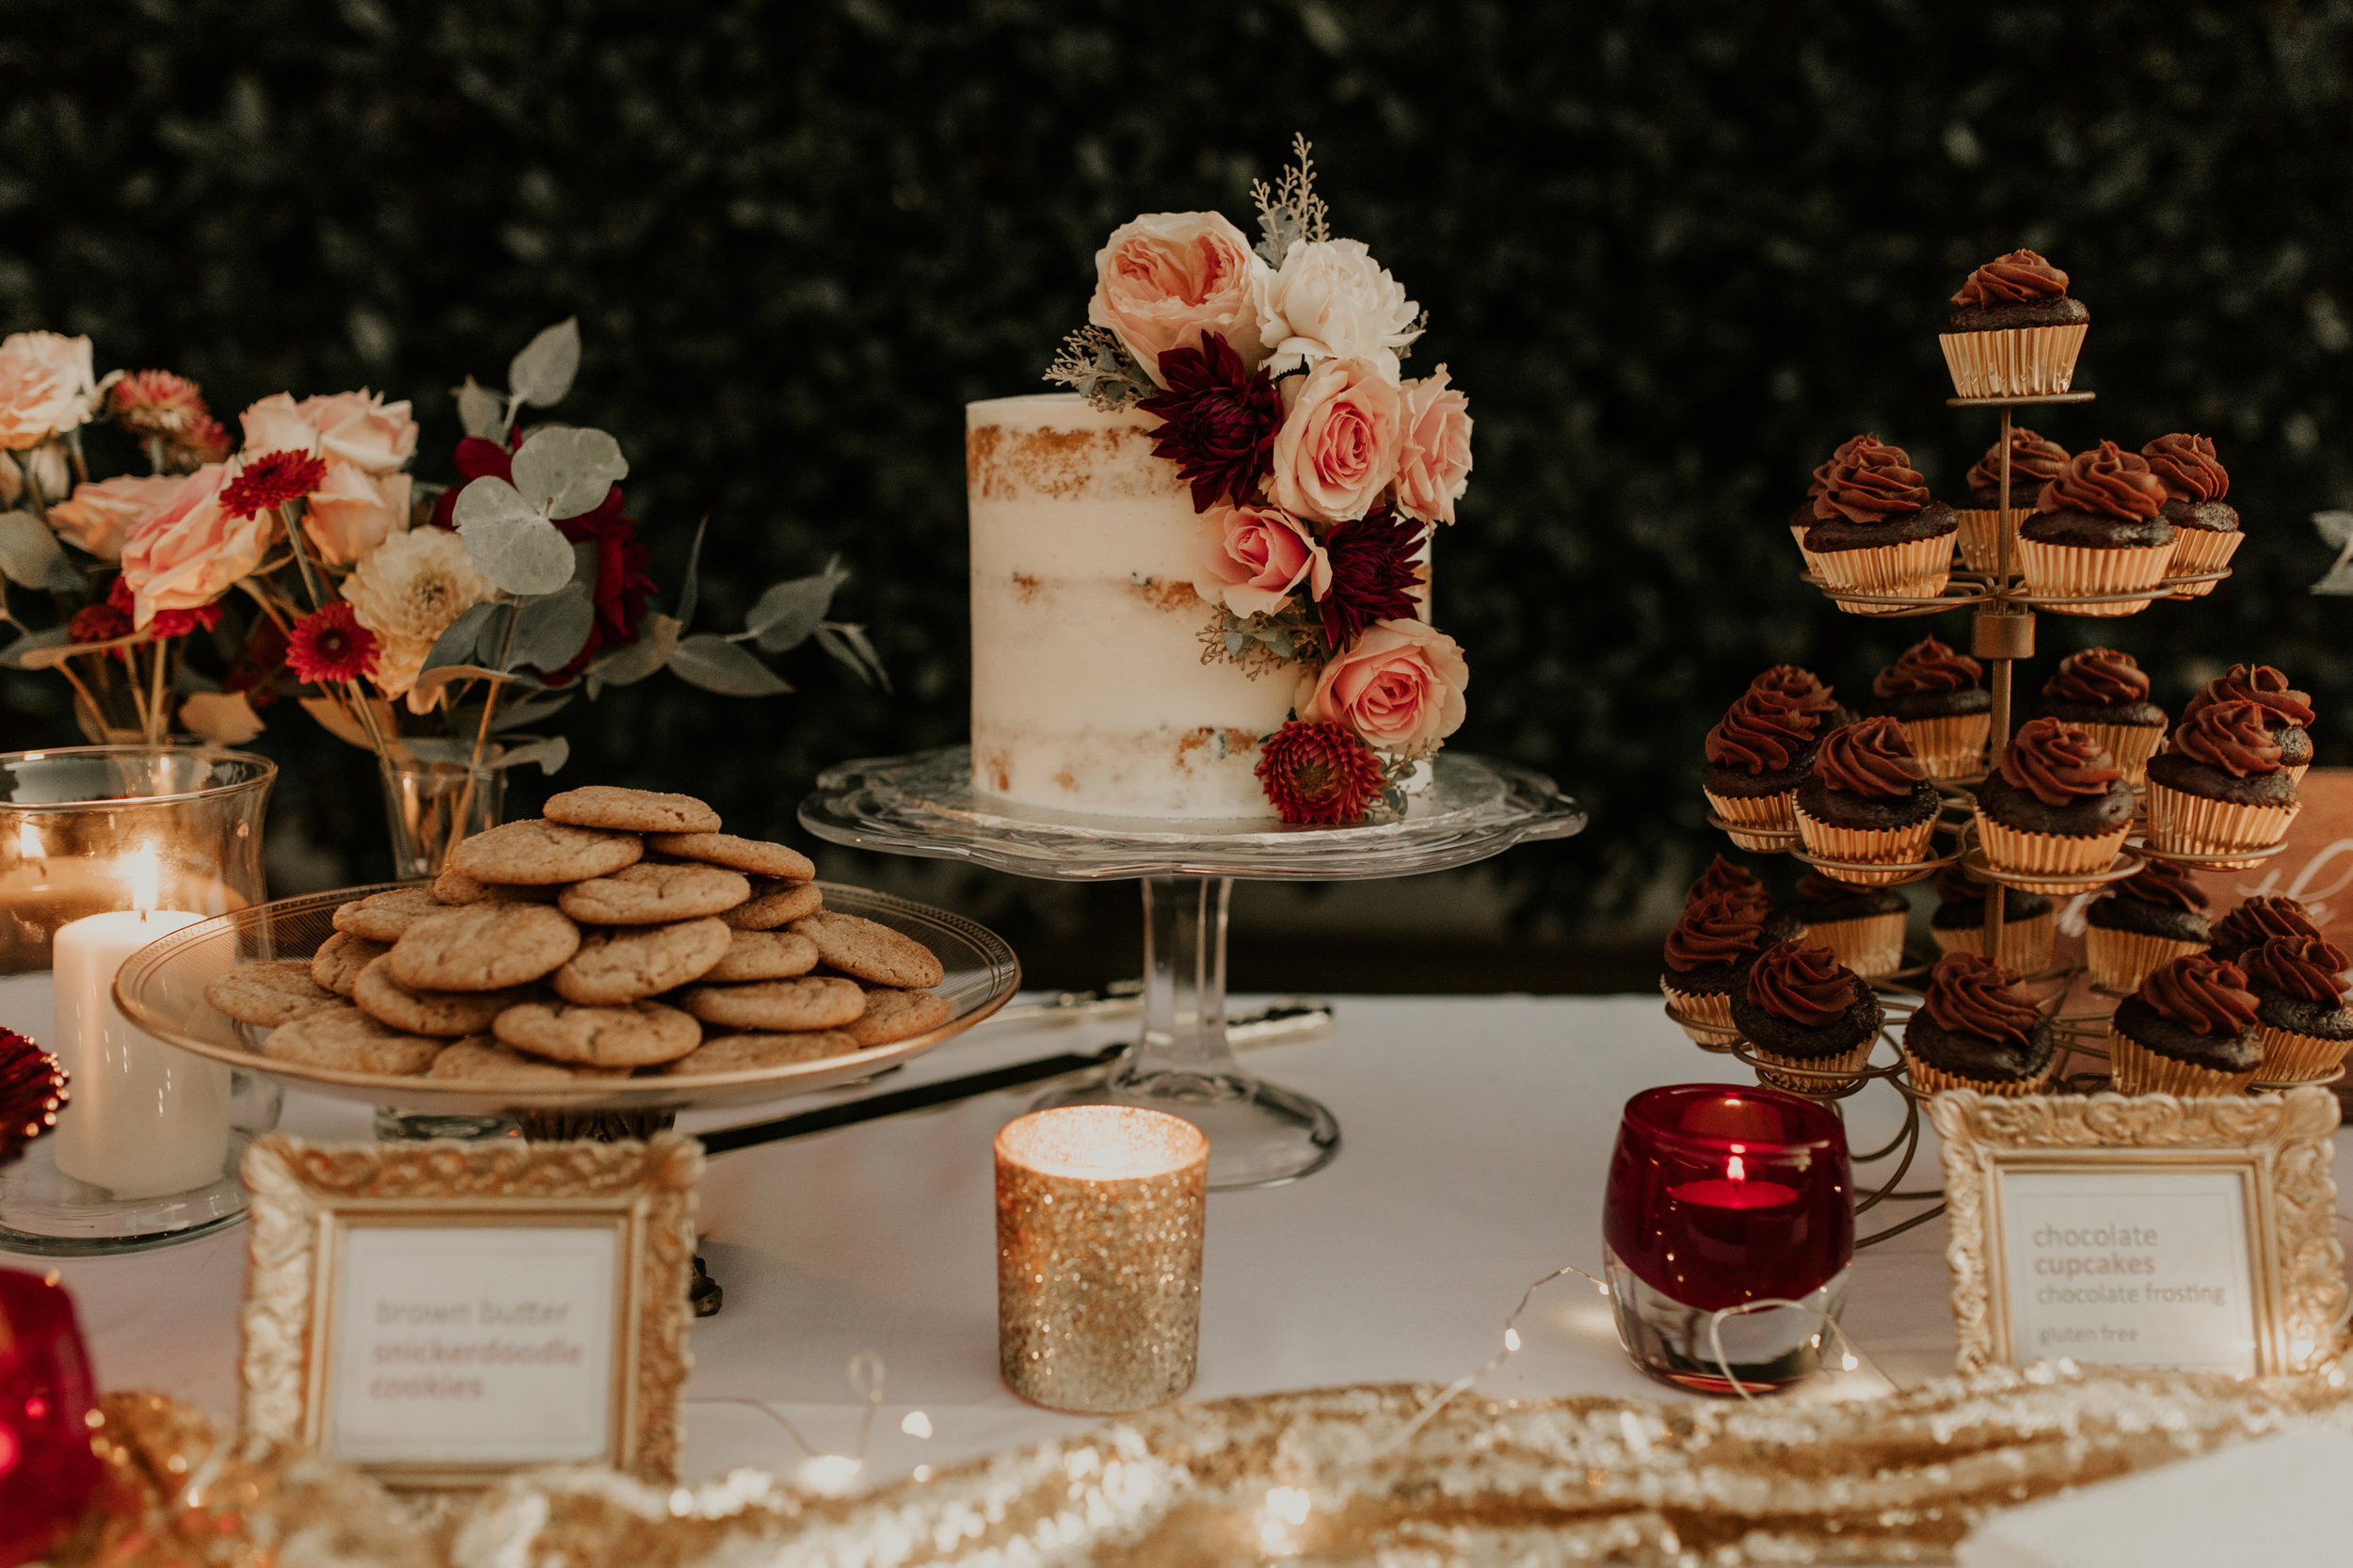 Dusty_Pink_Wedding_Florals_Sibyl_Sophia_Cake.jpg